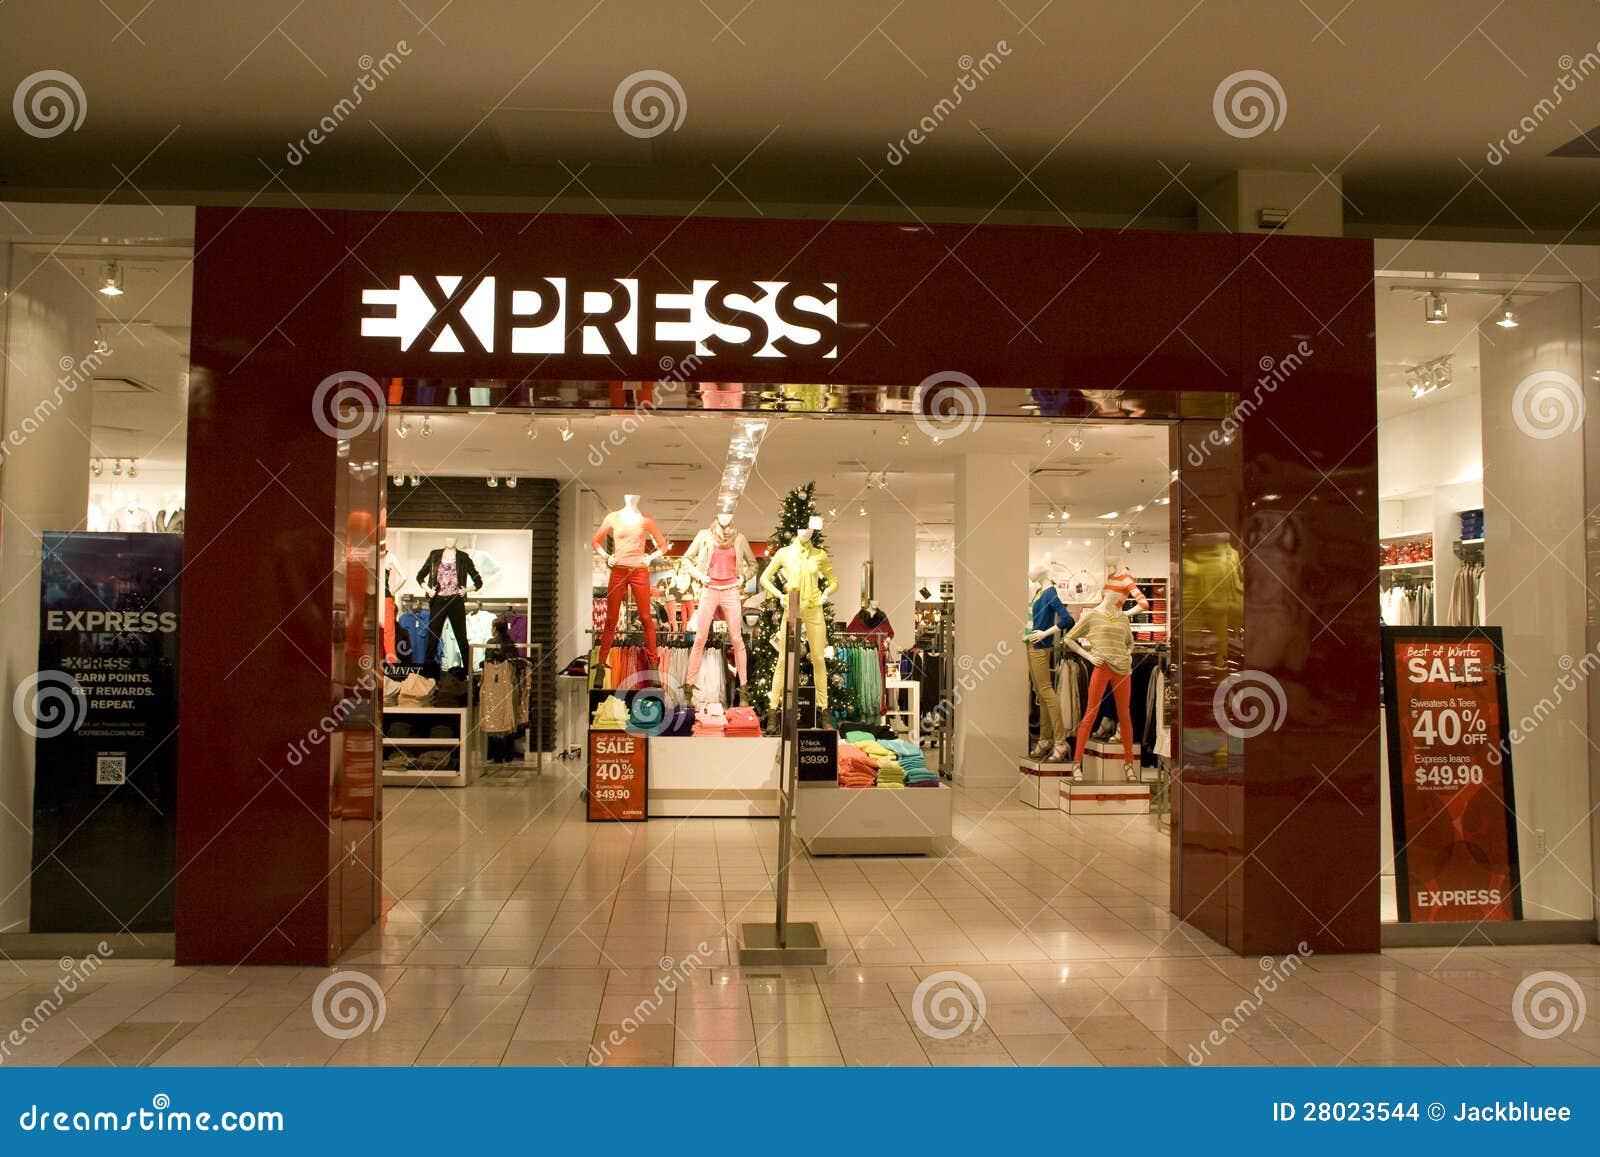 express-store-28023544.jpg